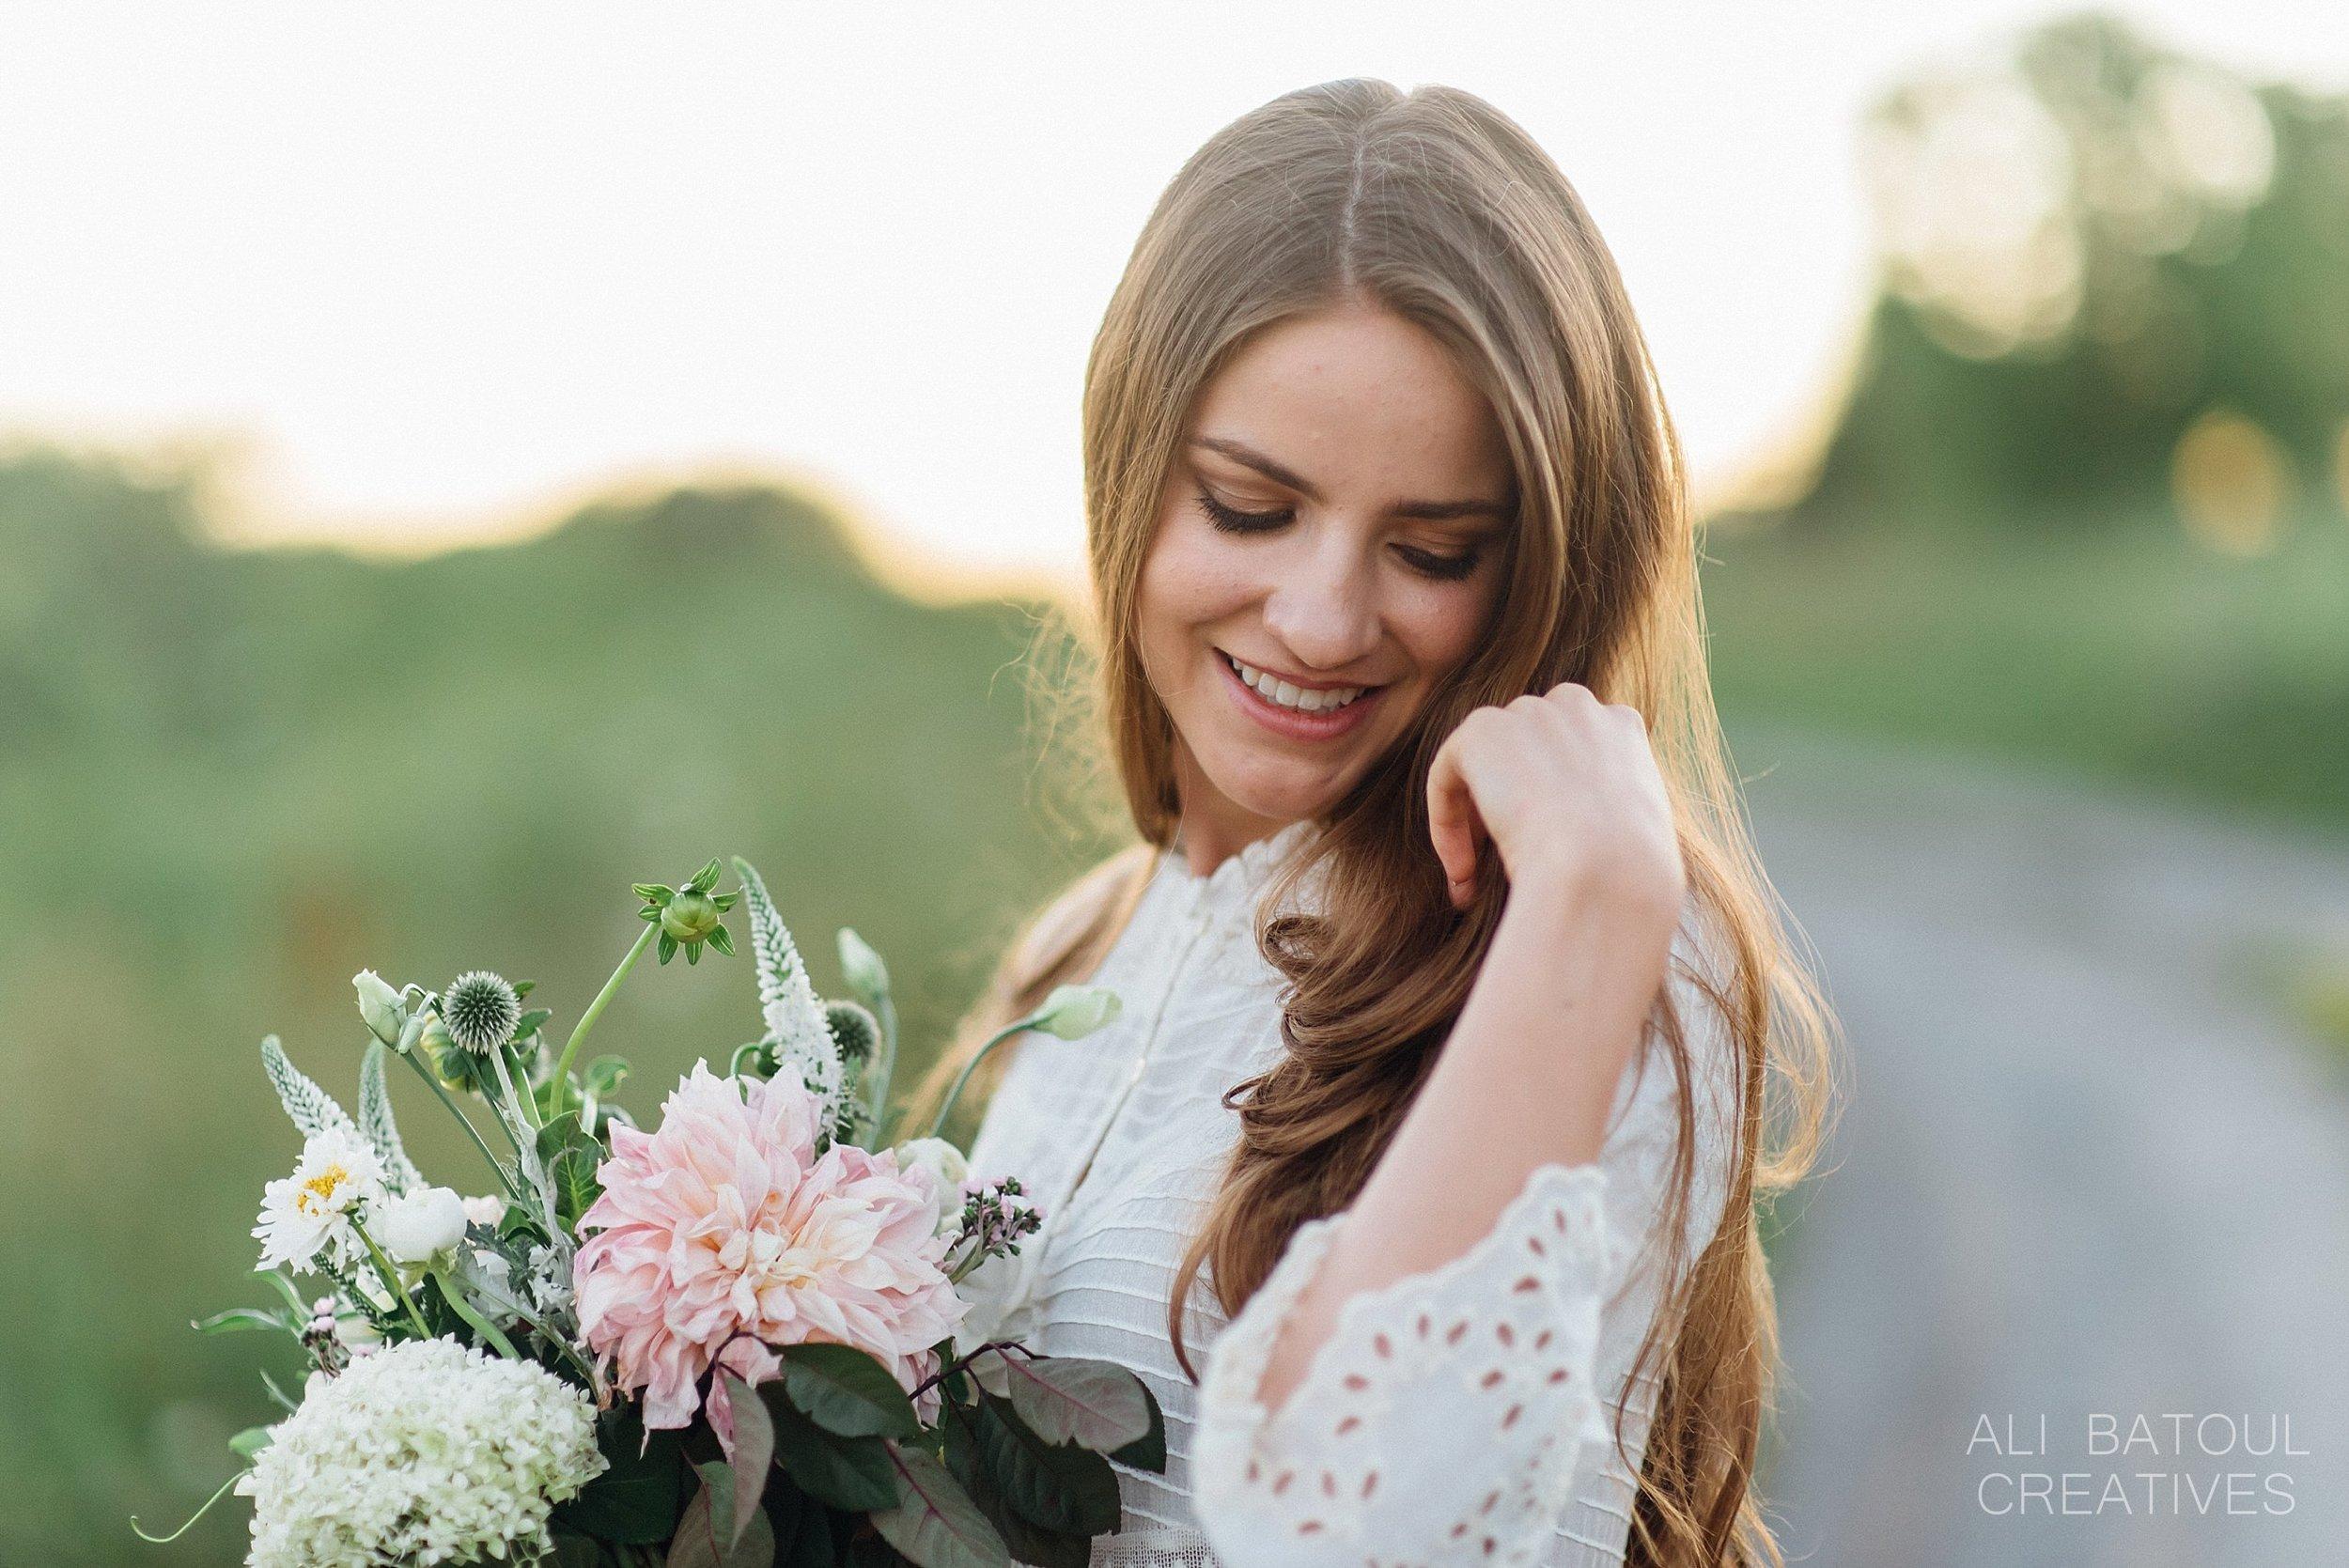 Boho Bridal Ottawa - Ali Batoul Creatives Fine Art Wedding Photography_0382.jpg